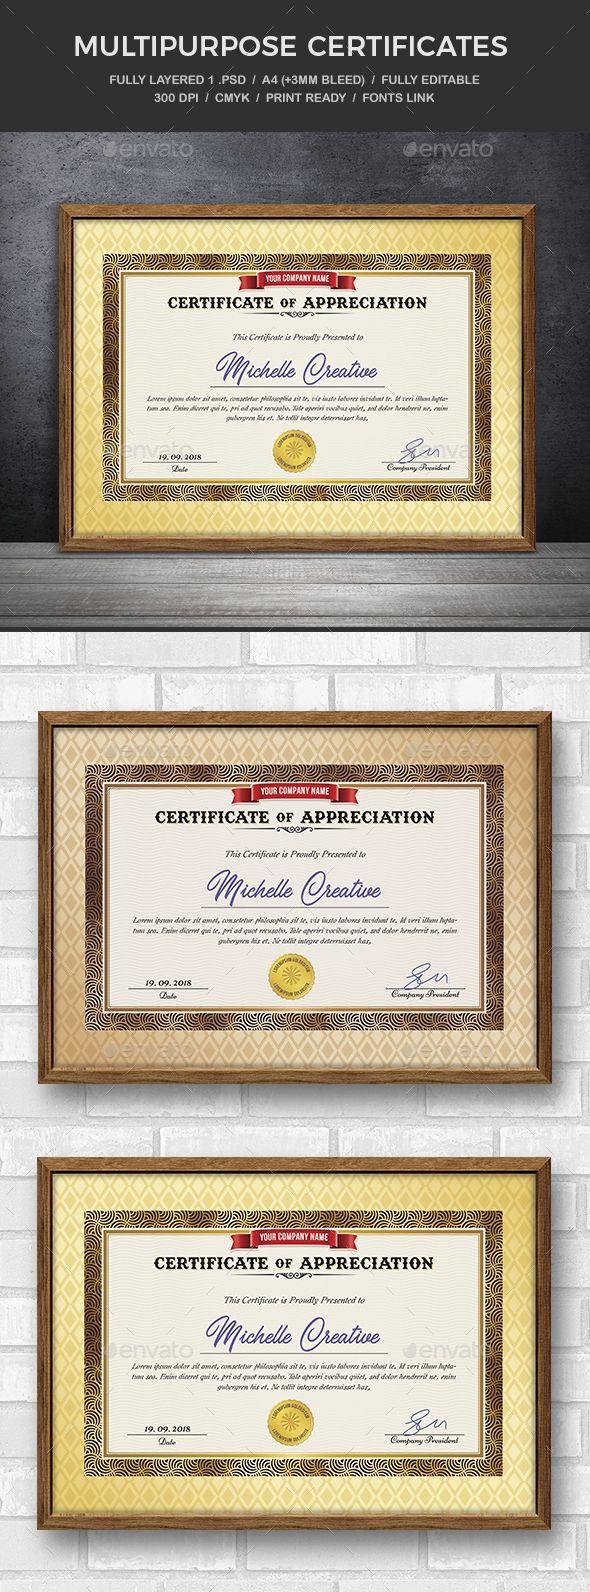 Certificate Template Certificate Templates Graduation Certificate Template Print Templates Where to buy award certificates